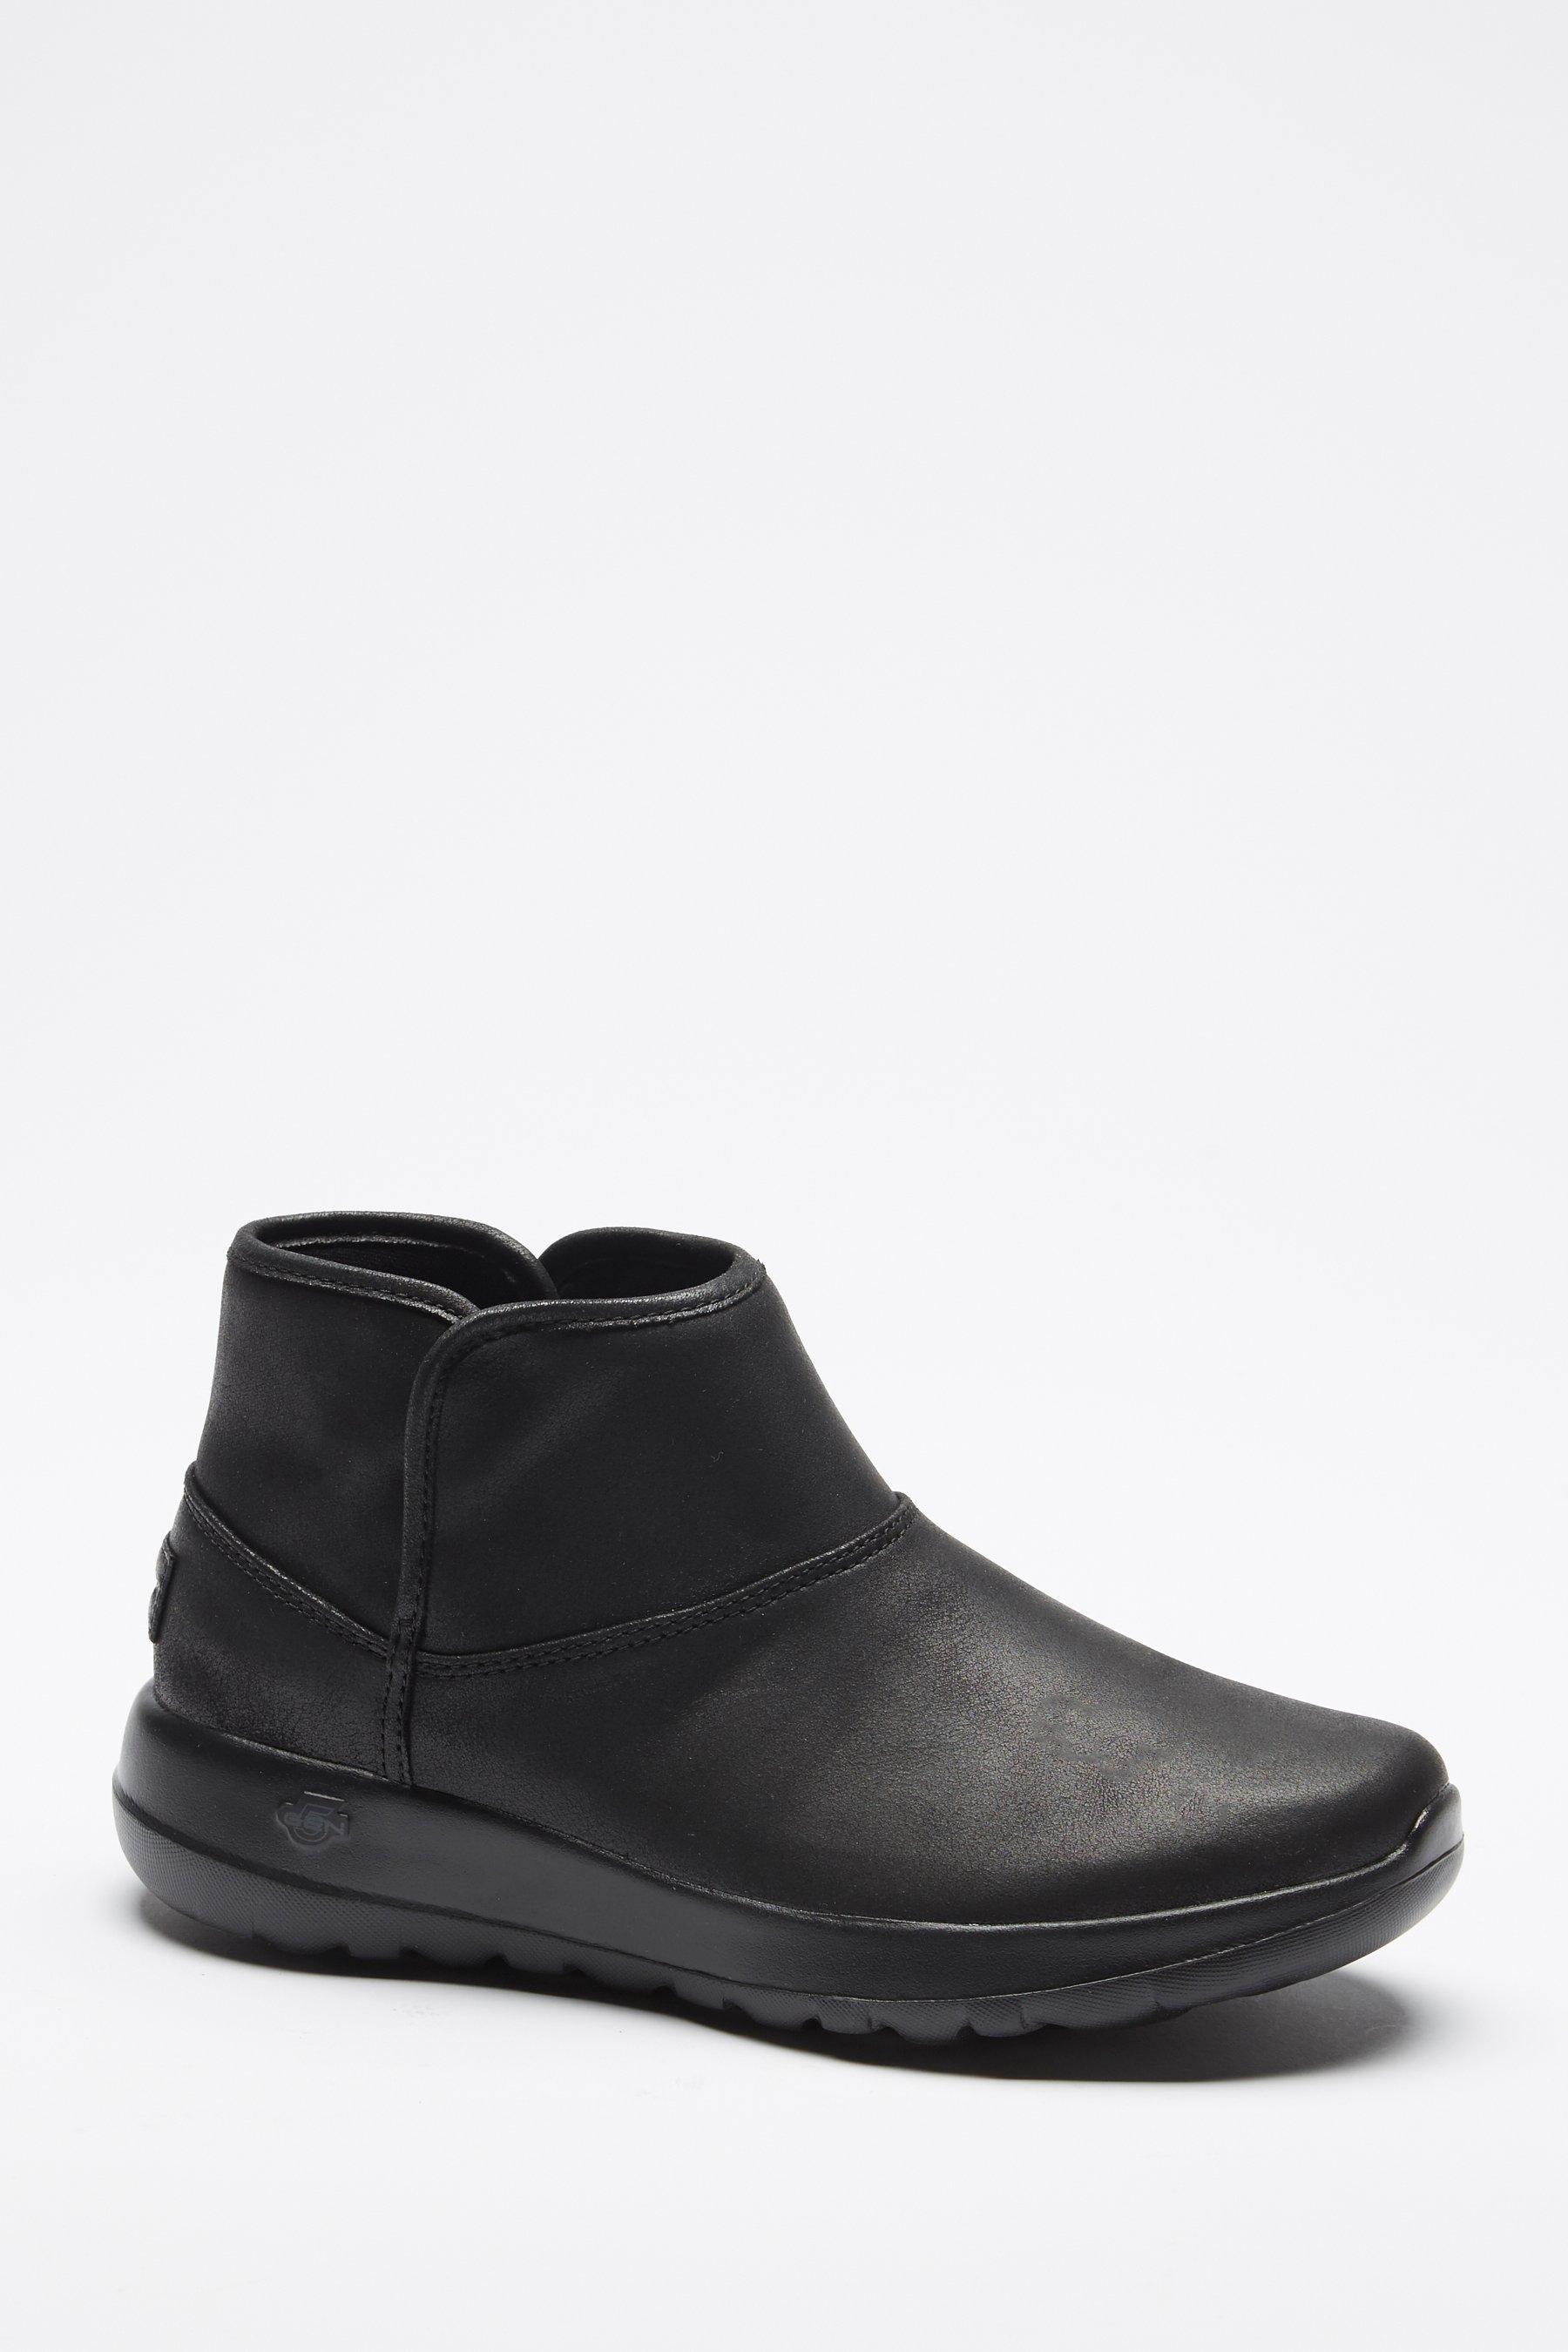 Go Joy Harvest Ankle Boots